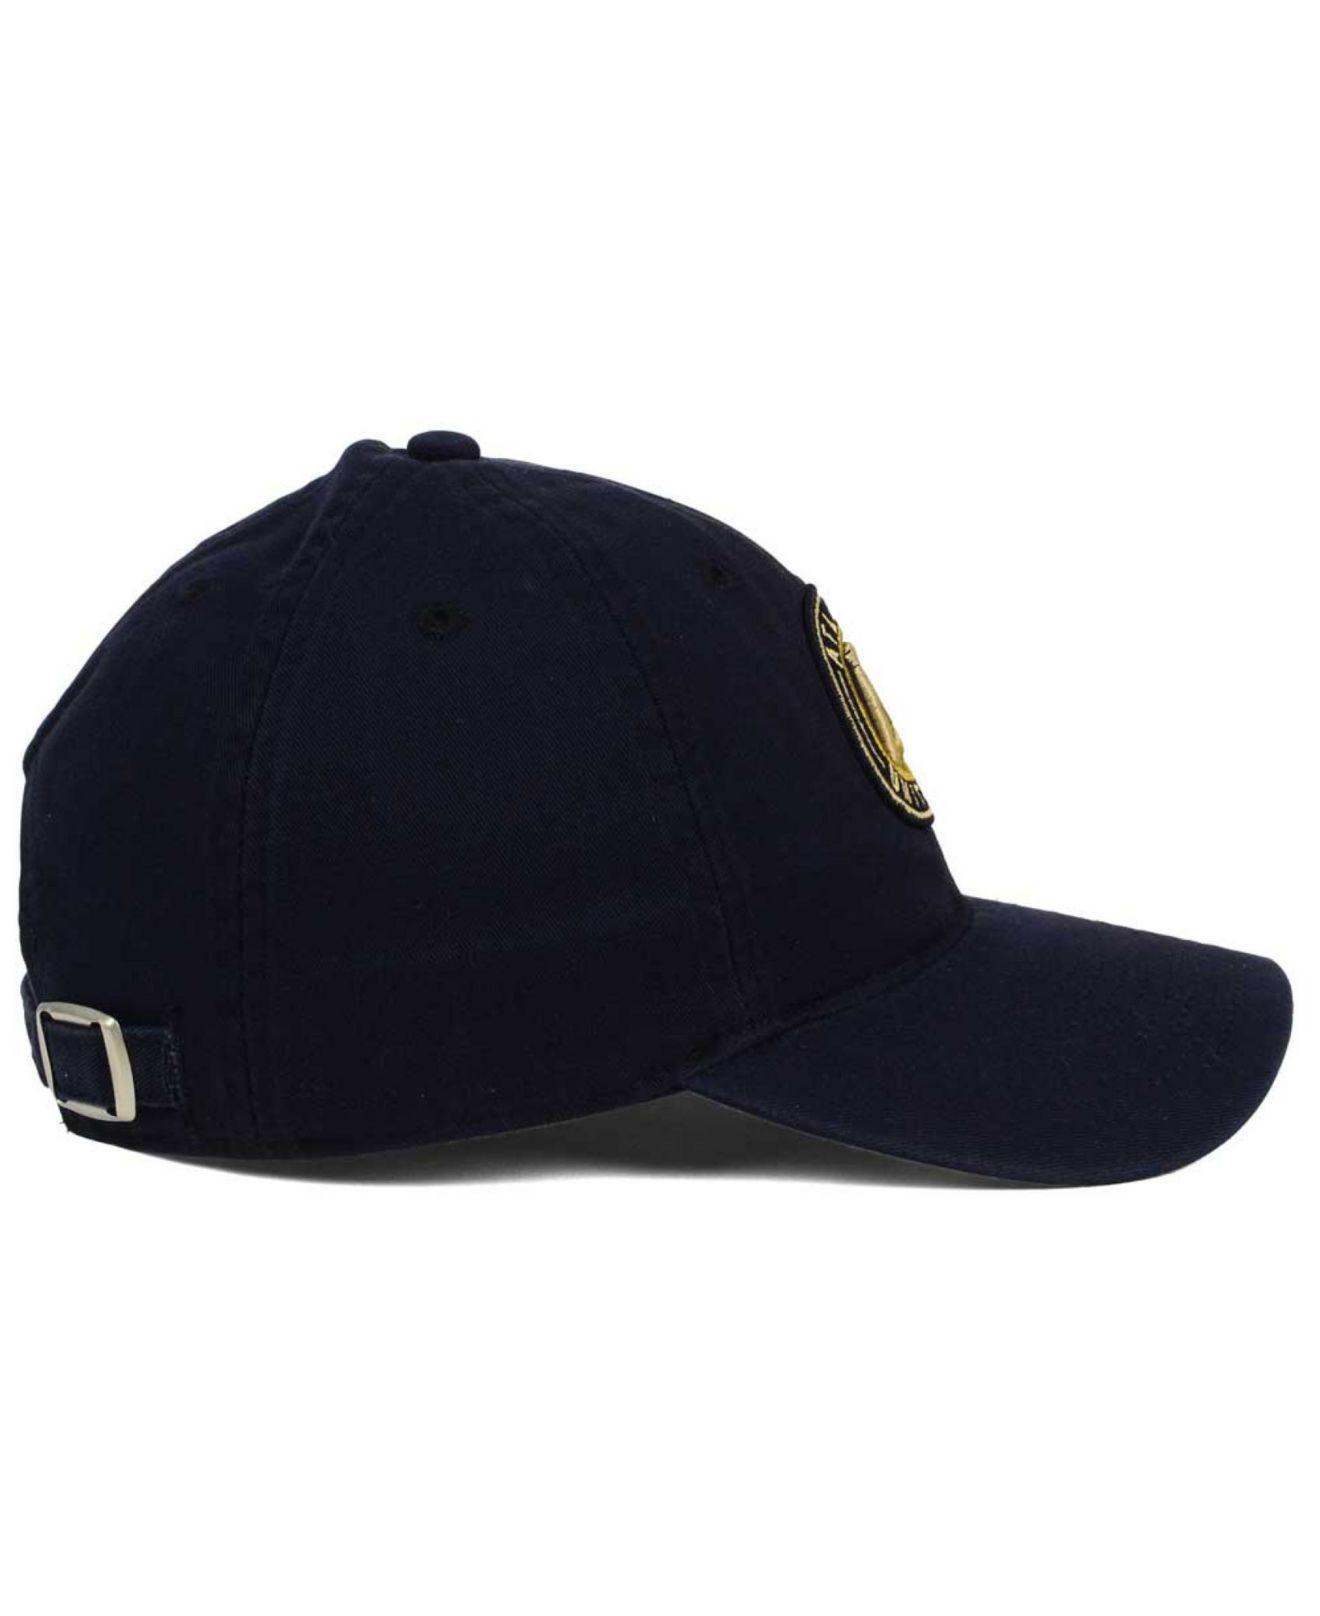 0e9592e22b3 ... hot lyst adidas atlanta united fc ntd easy adjustable cap in black for  men bba7f 93757